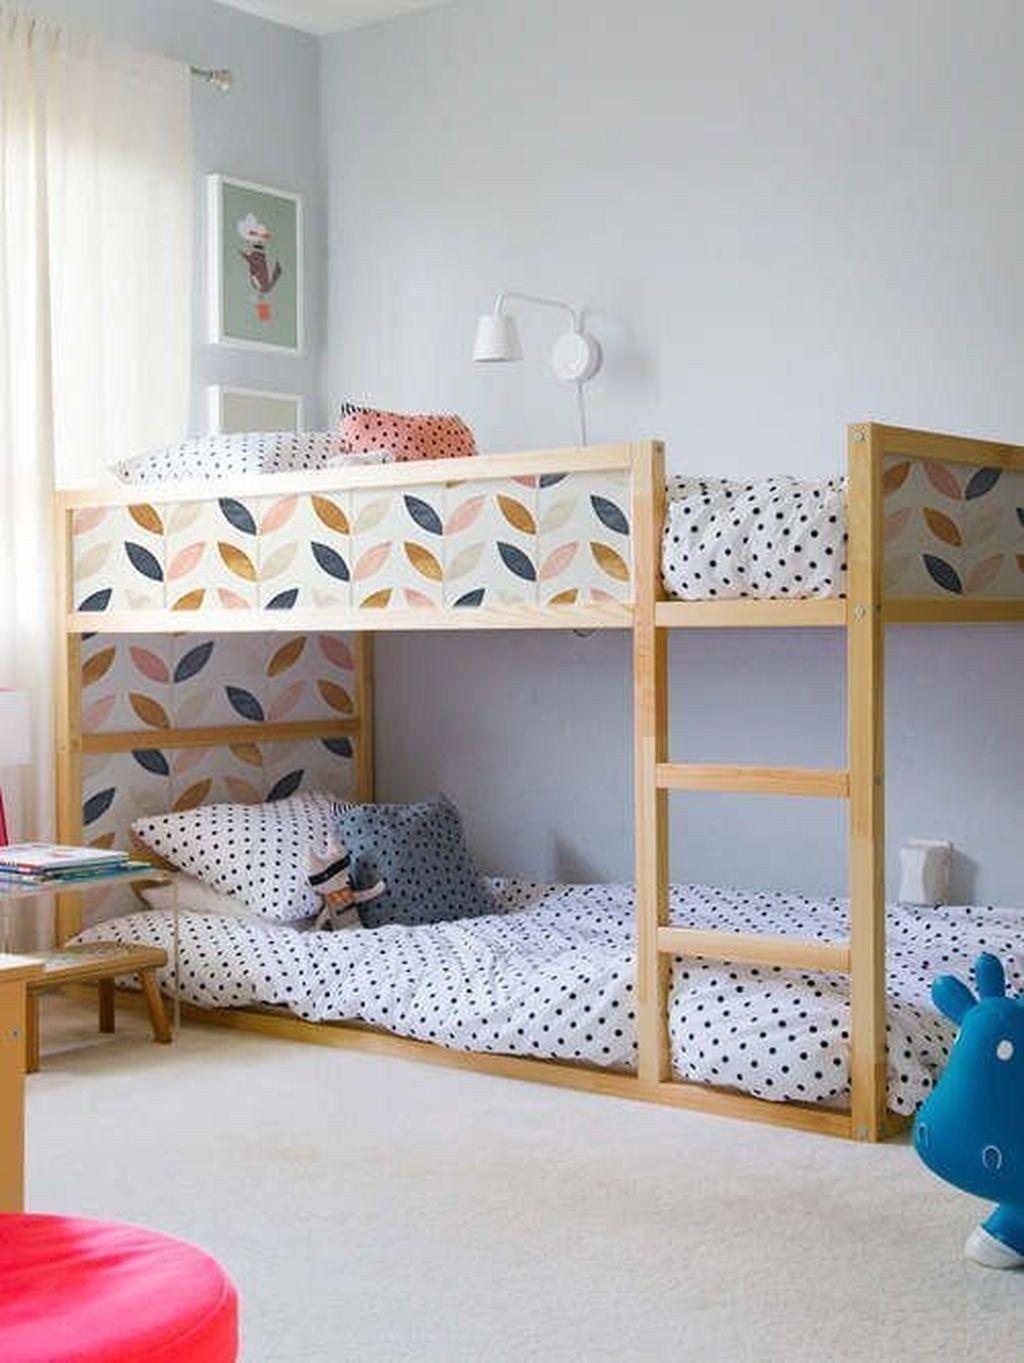 cool ikea kura beds ideas for your kids room11 | boho house inspo in